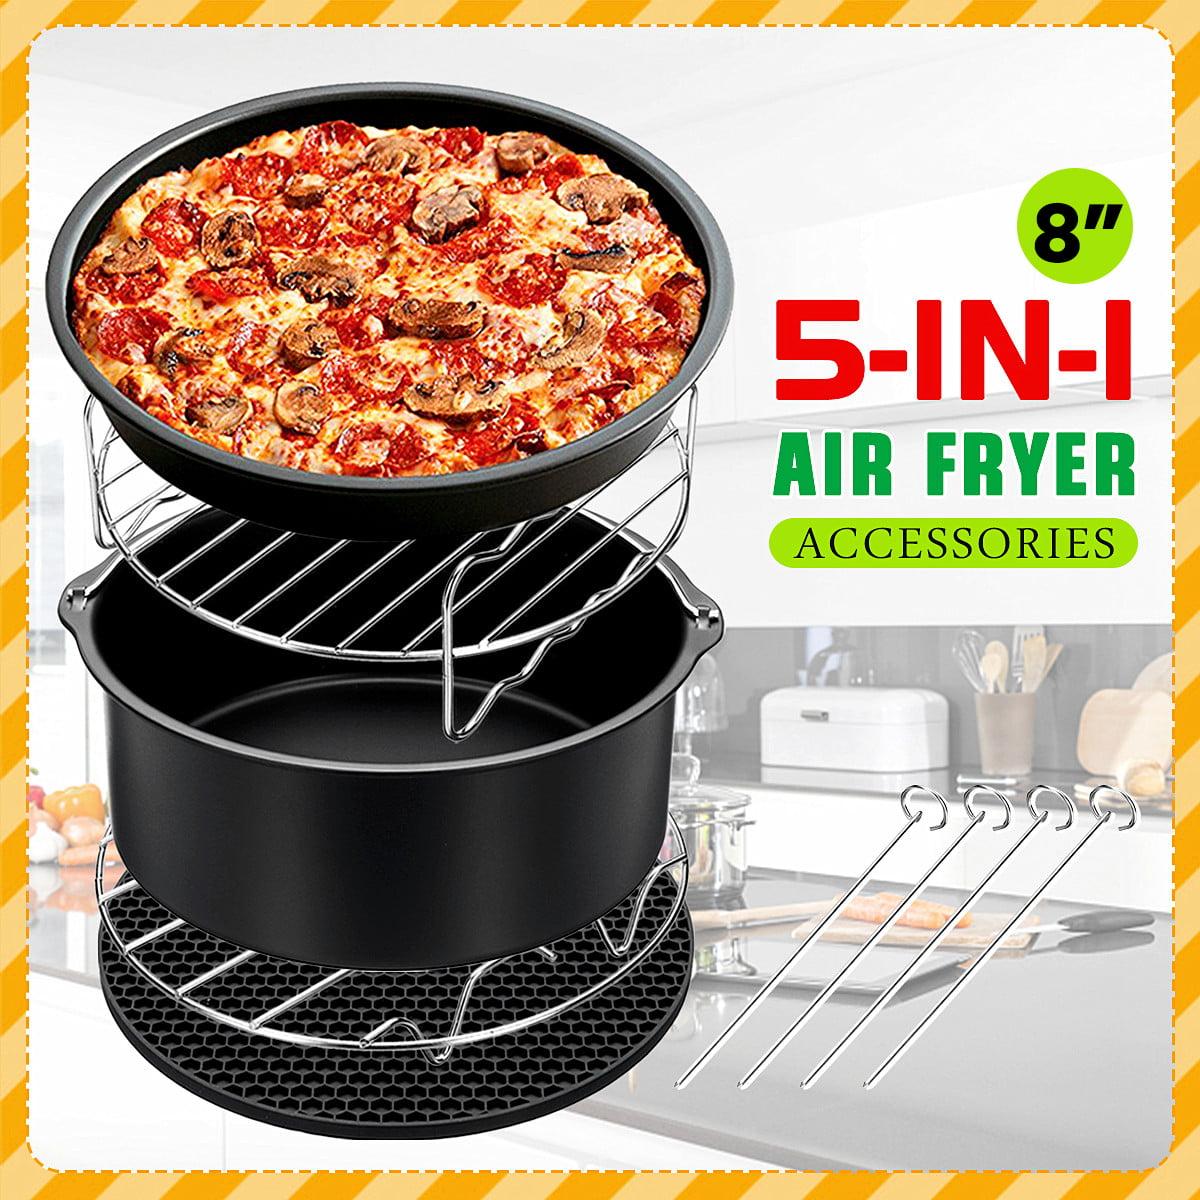 8'' Air Fryer Accessories Set Chips 5 IN 1 Baking Basket Rack For Phillips 4.2QT-6.8QT